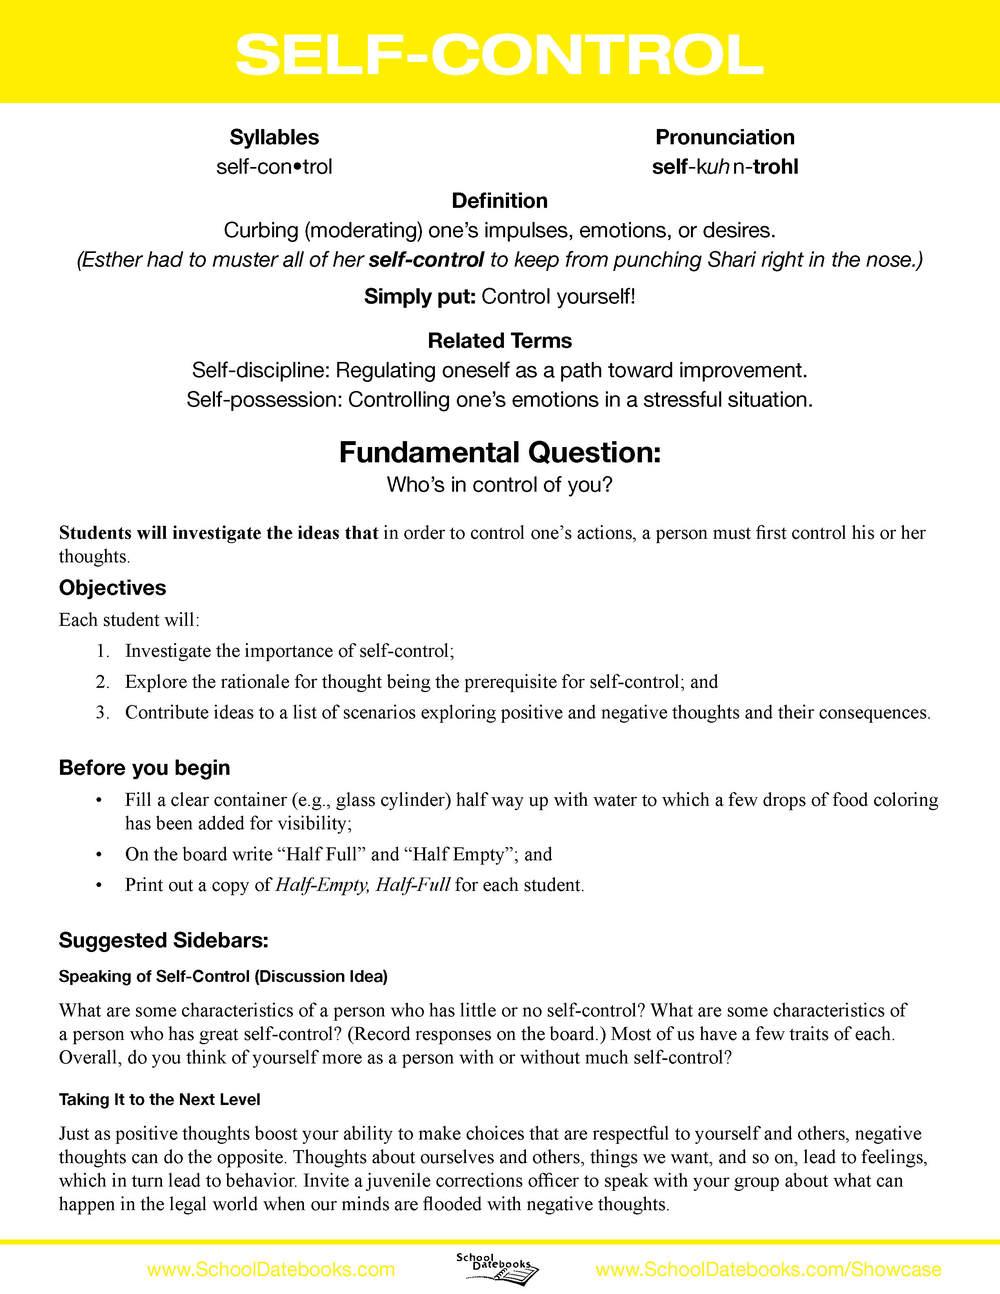 LessonPlan-Self-Control_Page_1.jpg